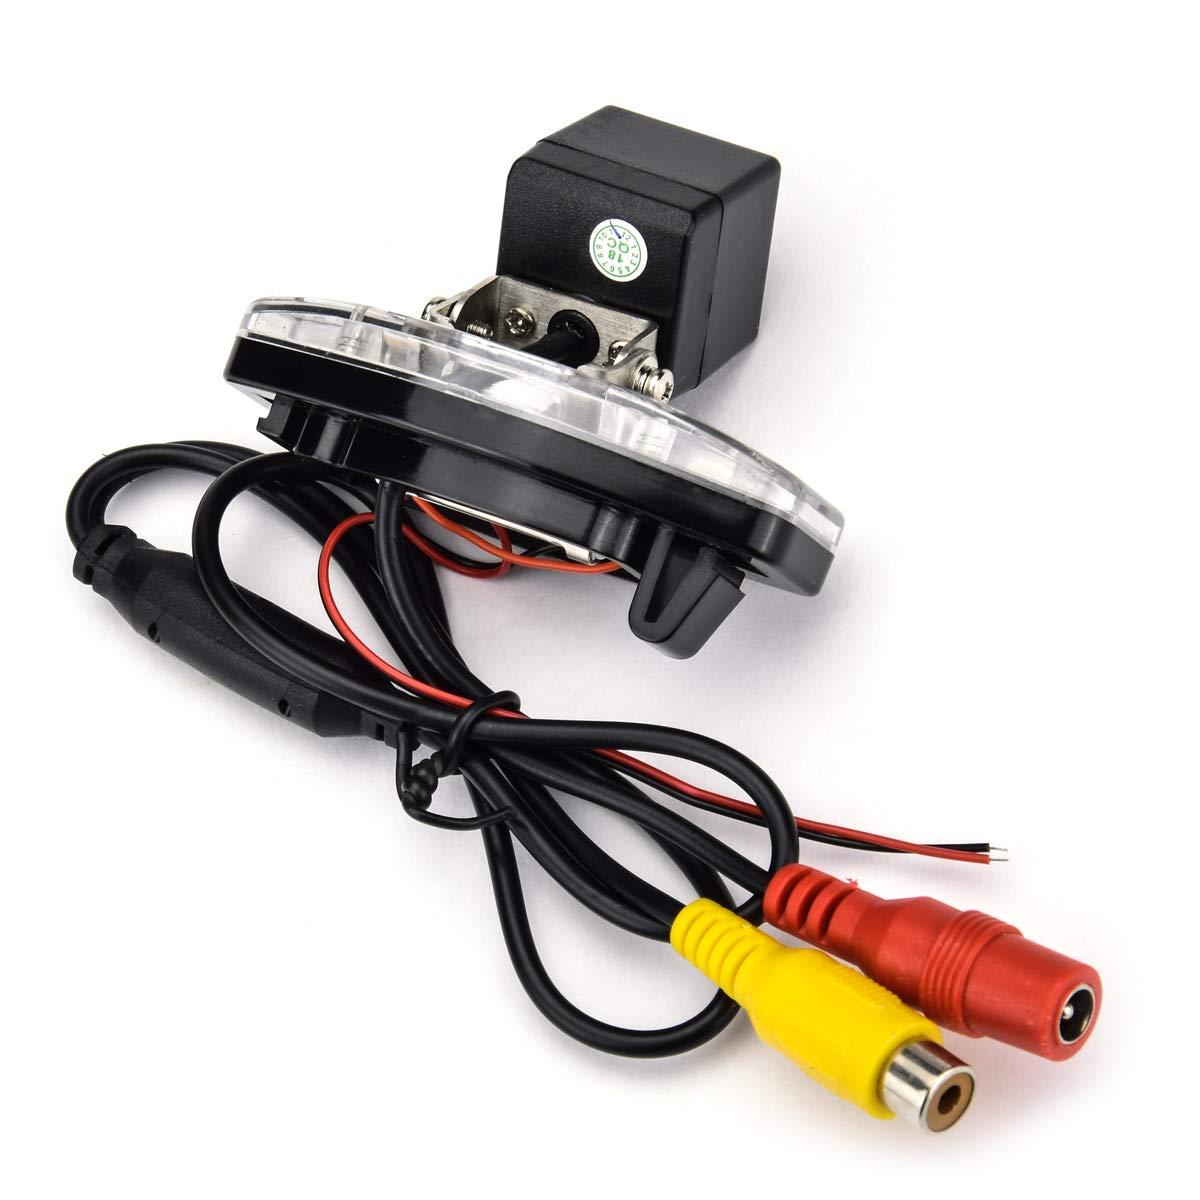 aSATAH 12 LED Adjustable Angle Car Rear View Camera for Honda Accord//Inspire//Spirior//Honda Civic VII VIII//Honda City 4D /& Waterproof and Shockproof Reversing Backup Camera 12 LED Adjustable Angle